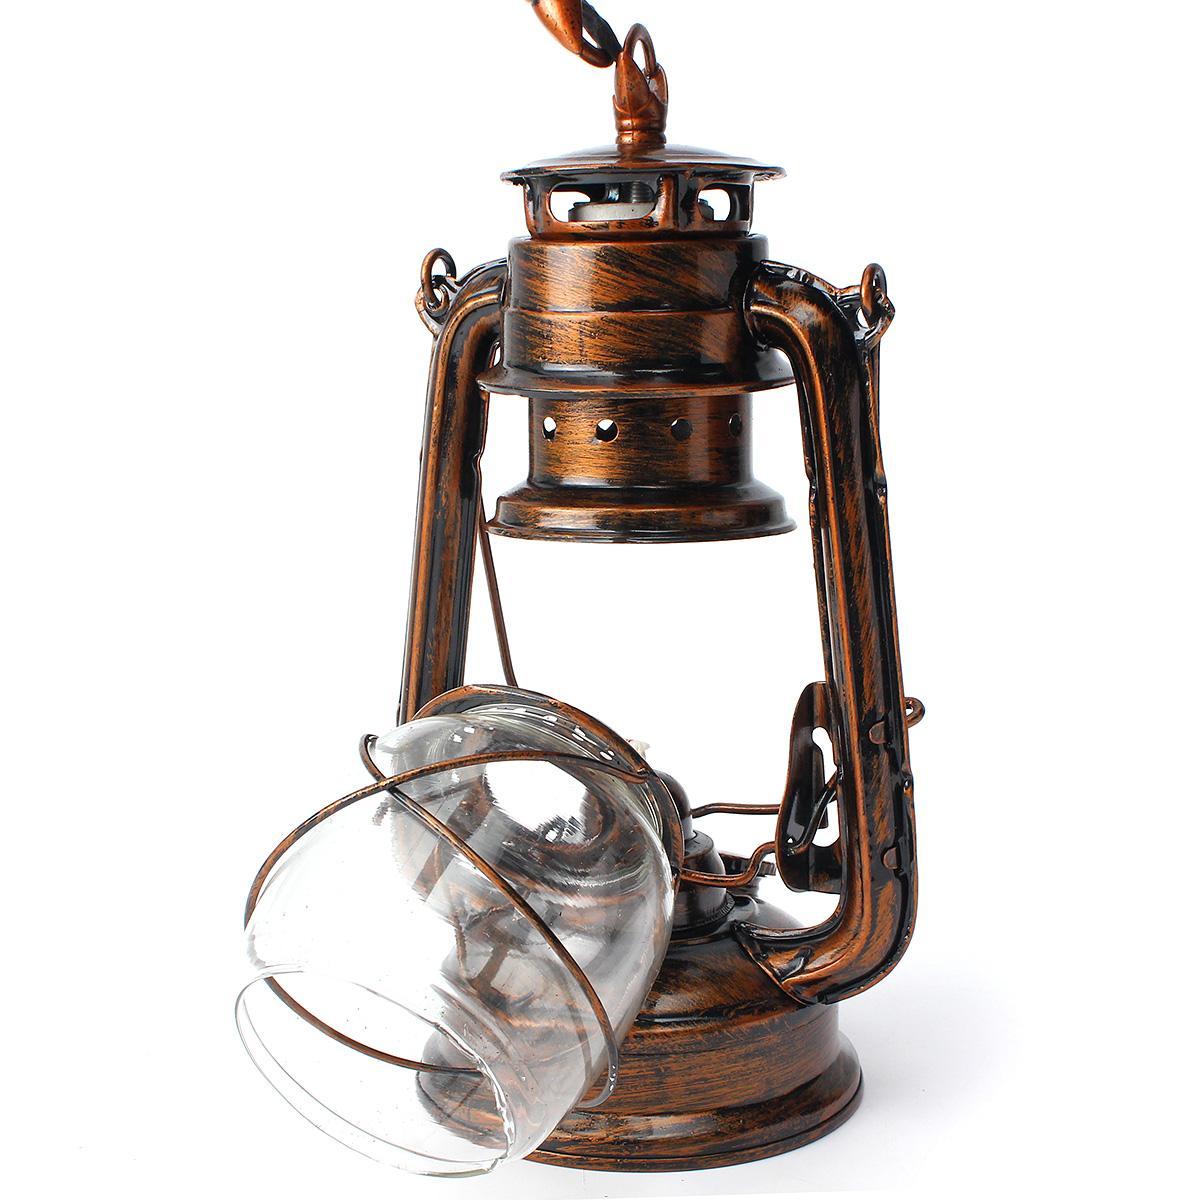 Retro antique vintage rustic lantern lamp wall sconce light fixture outdoor e27